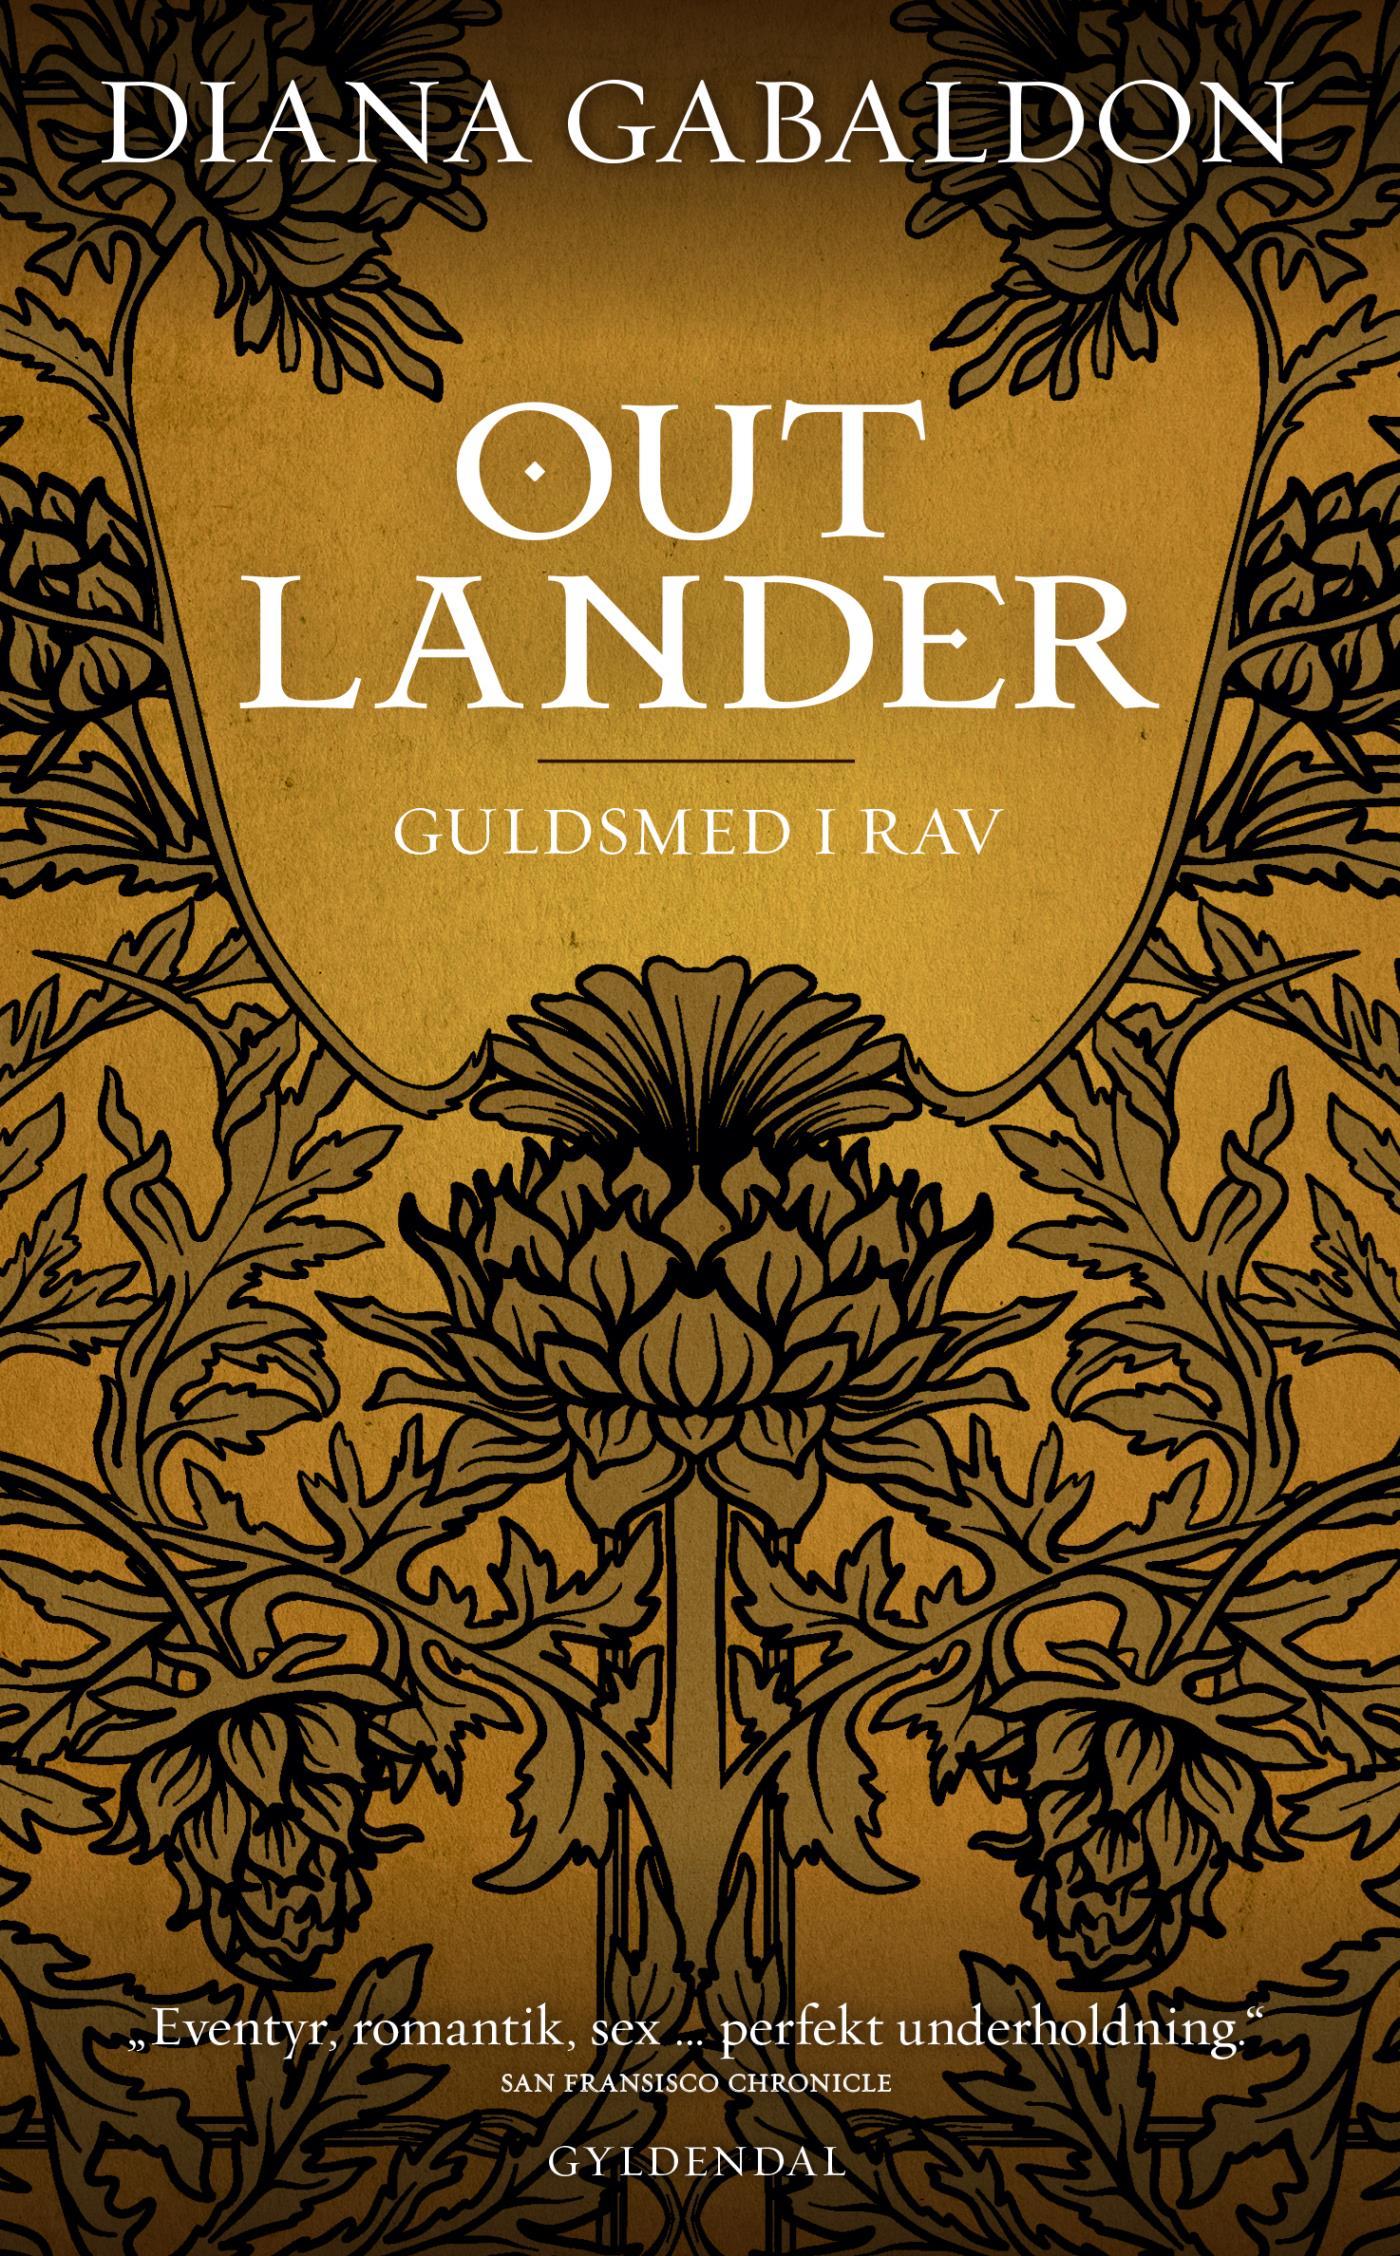 Guldsmed i rav 1-2: Outlander